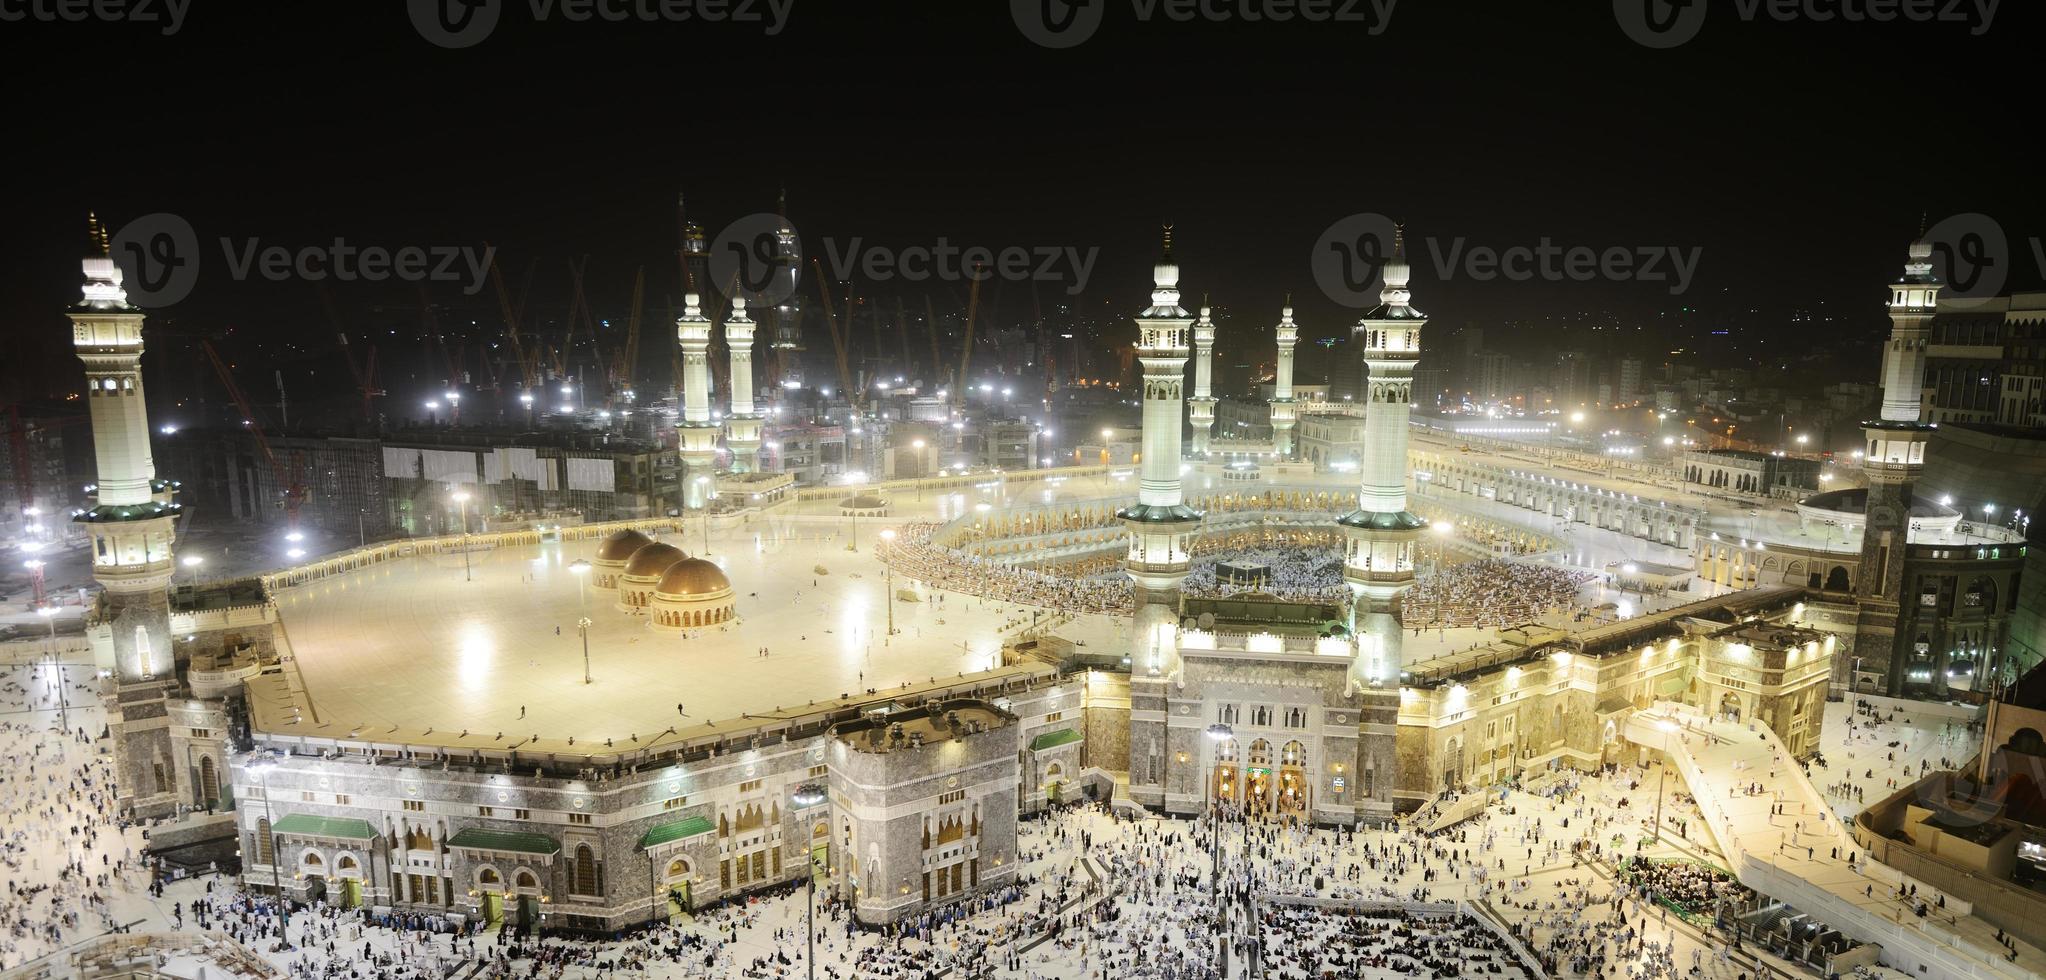 makkah kaaba en mensen die komen voor hadj foto